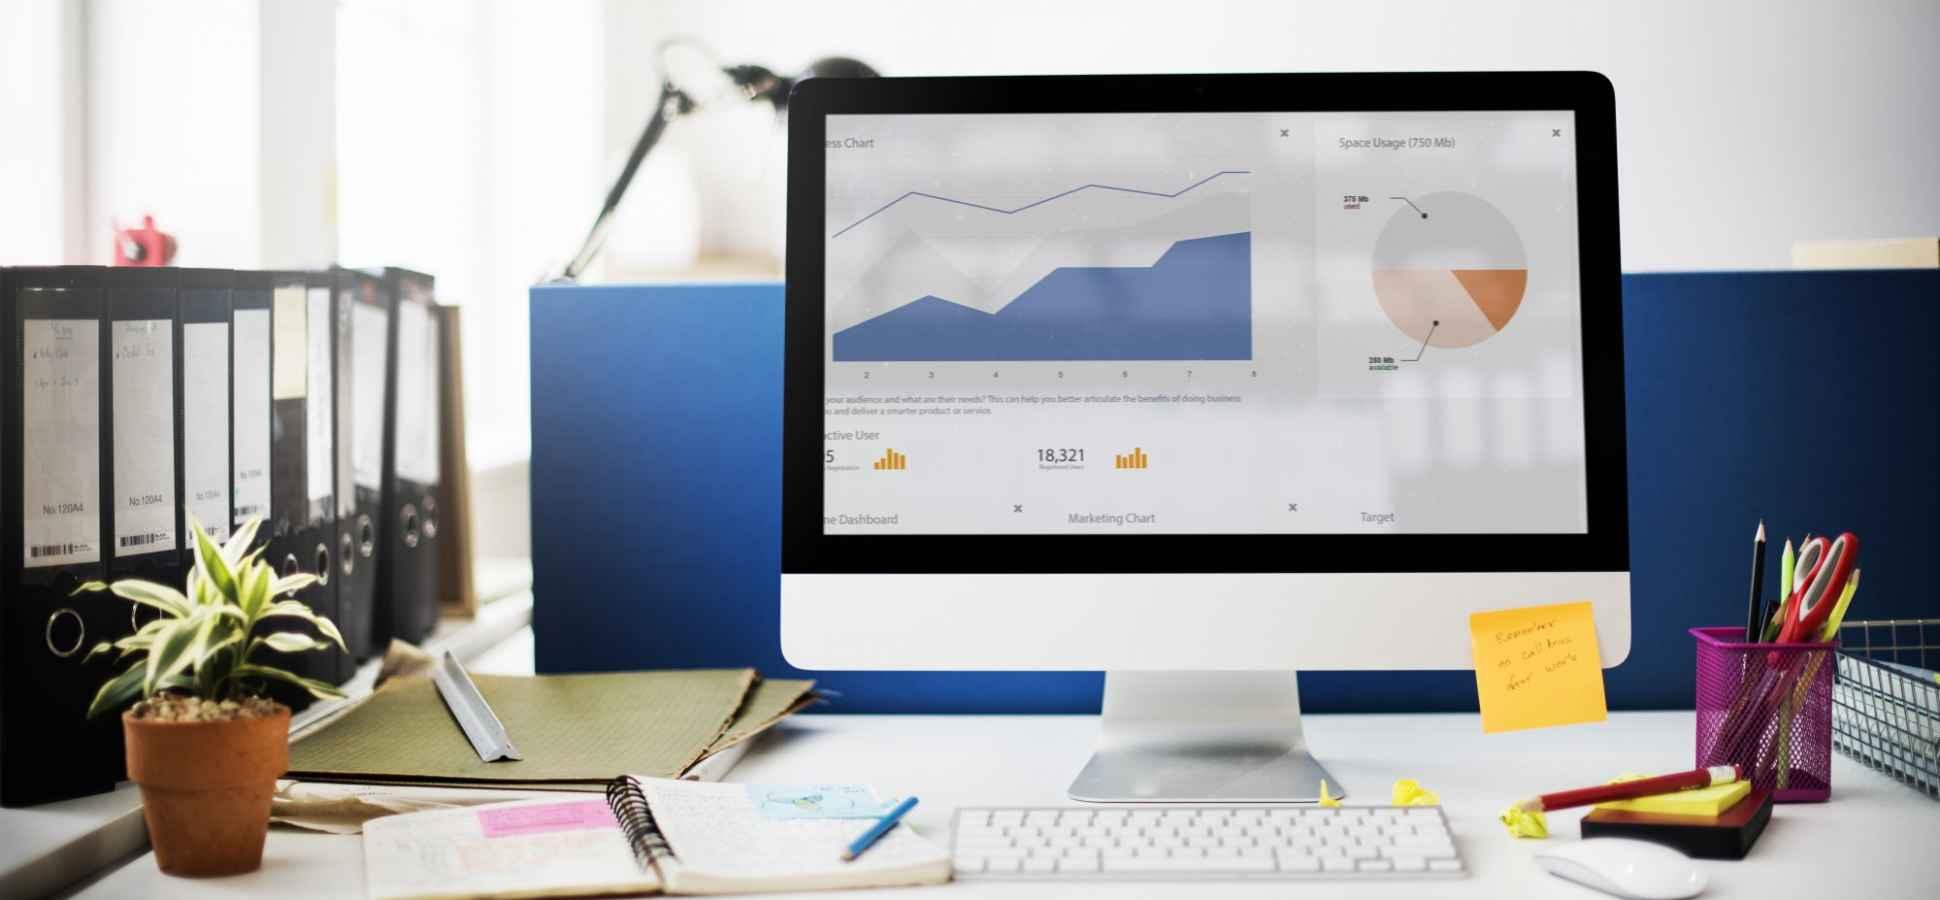 Why Every Company Needs an Innovation Dashboard